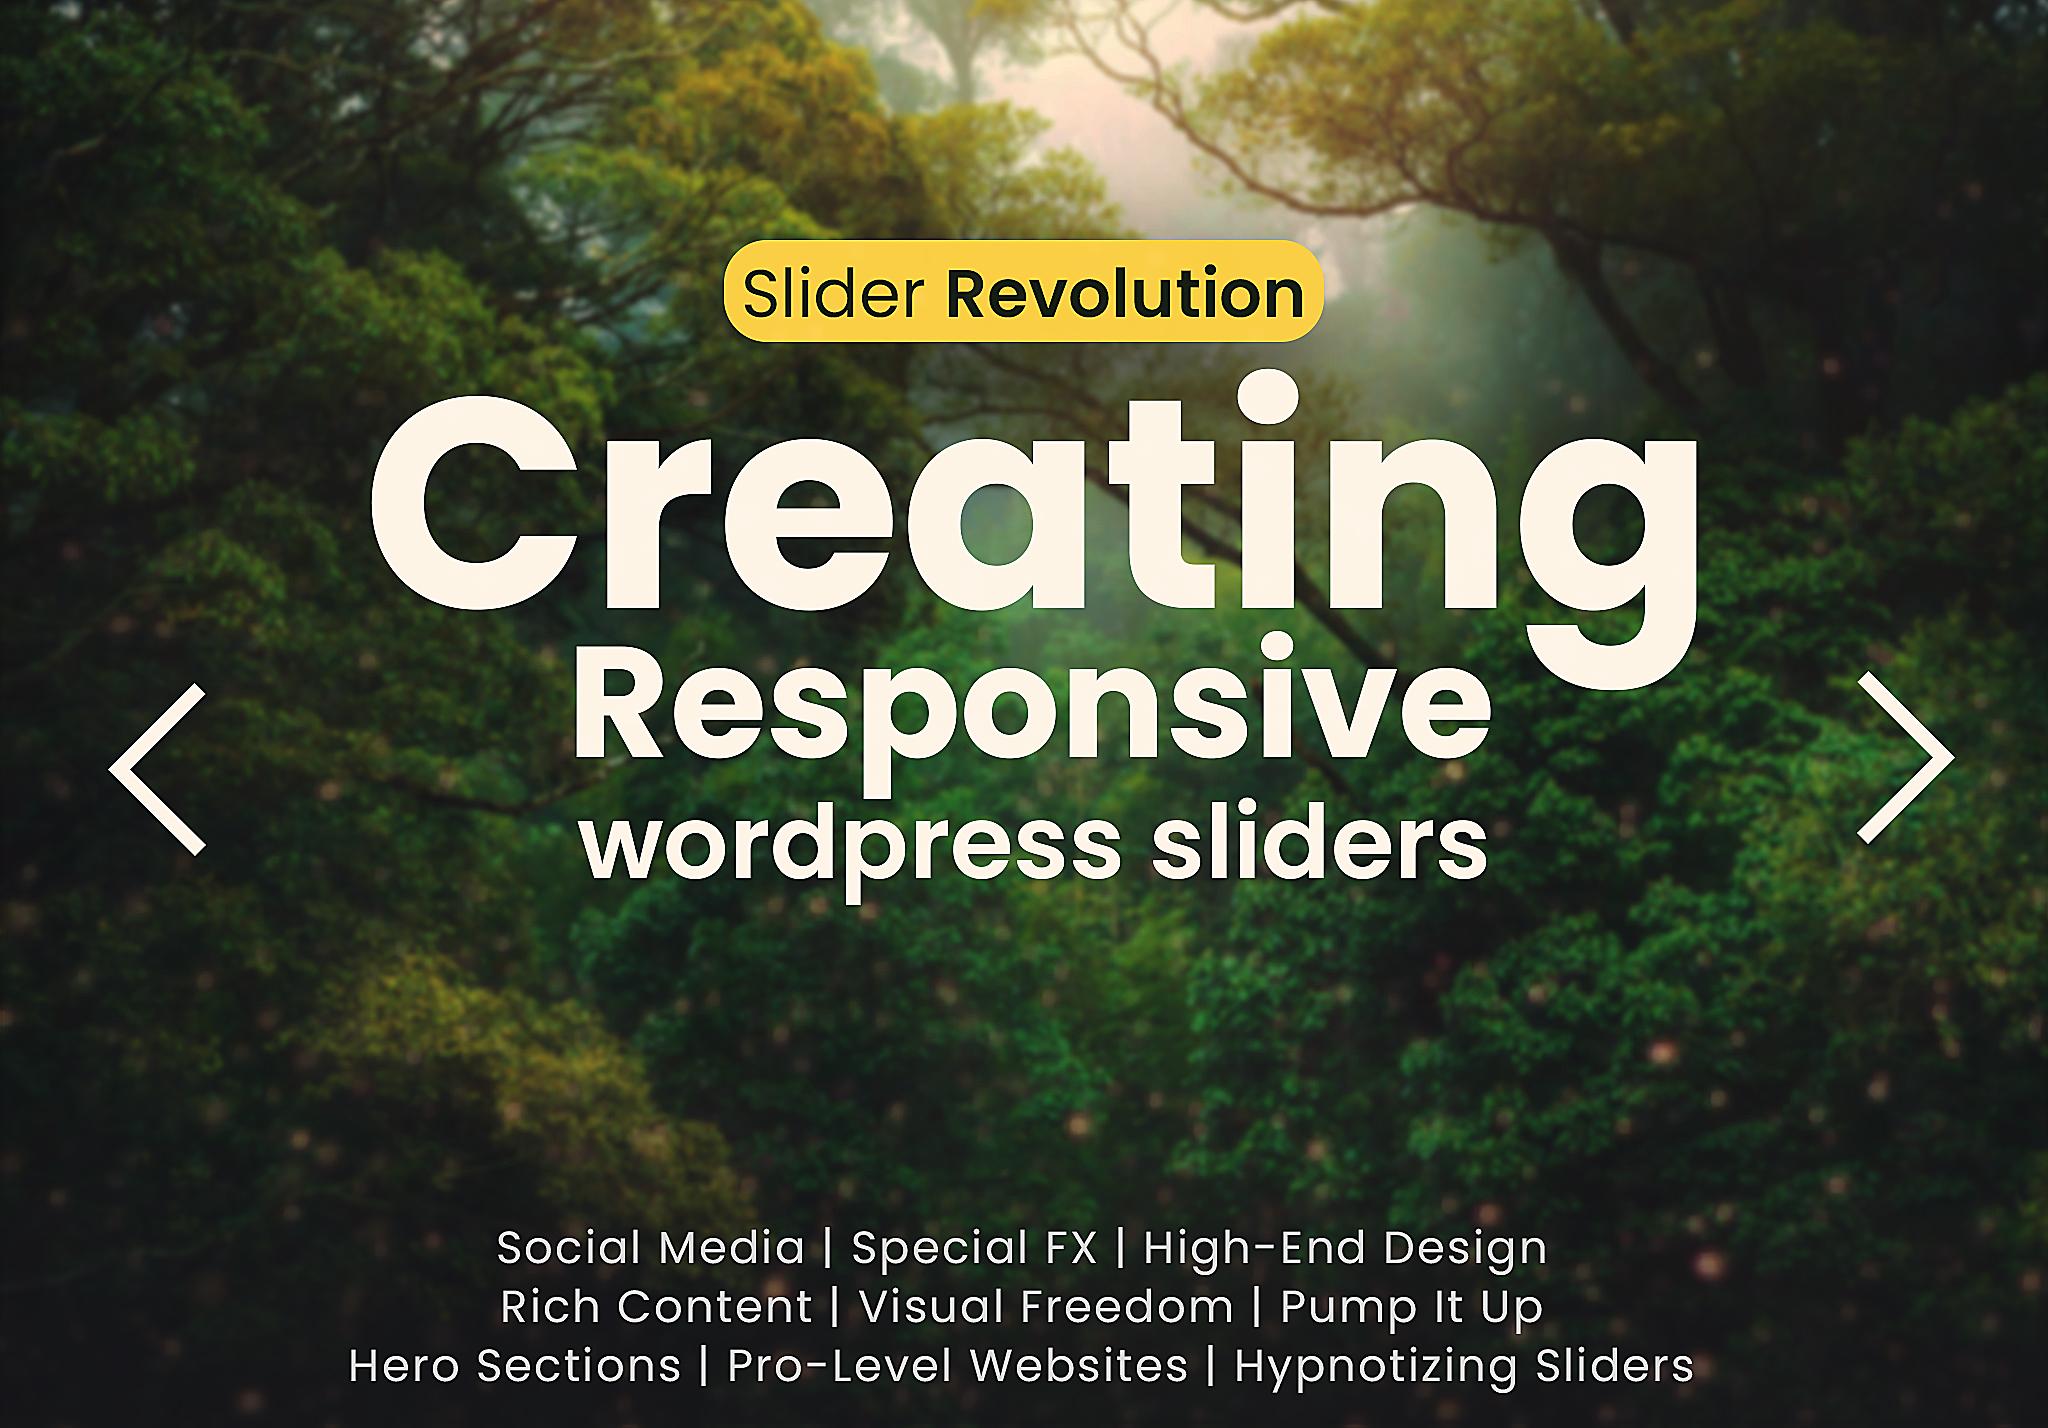 Creating responsive WordPress sliders using Slider Revolution